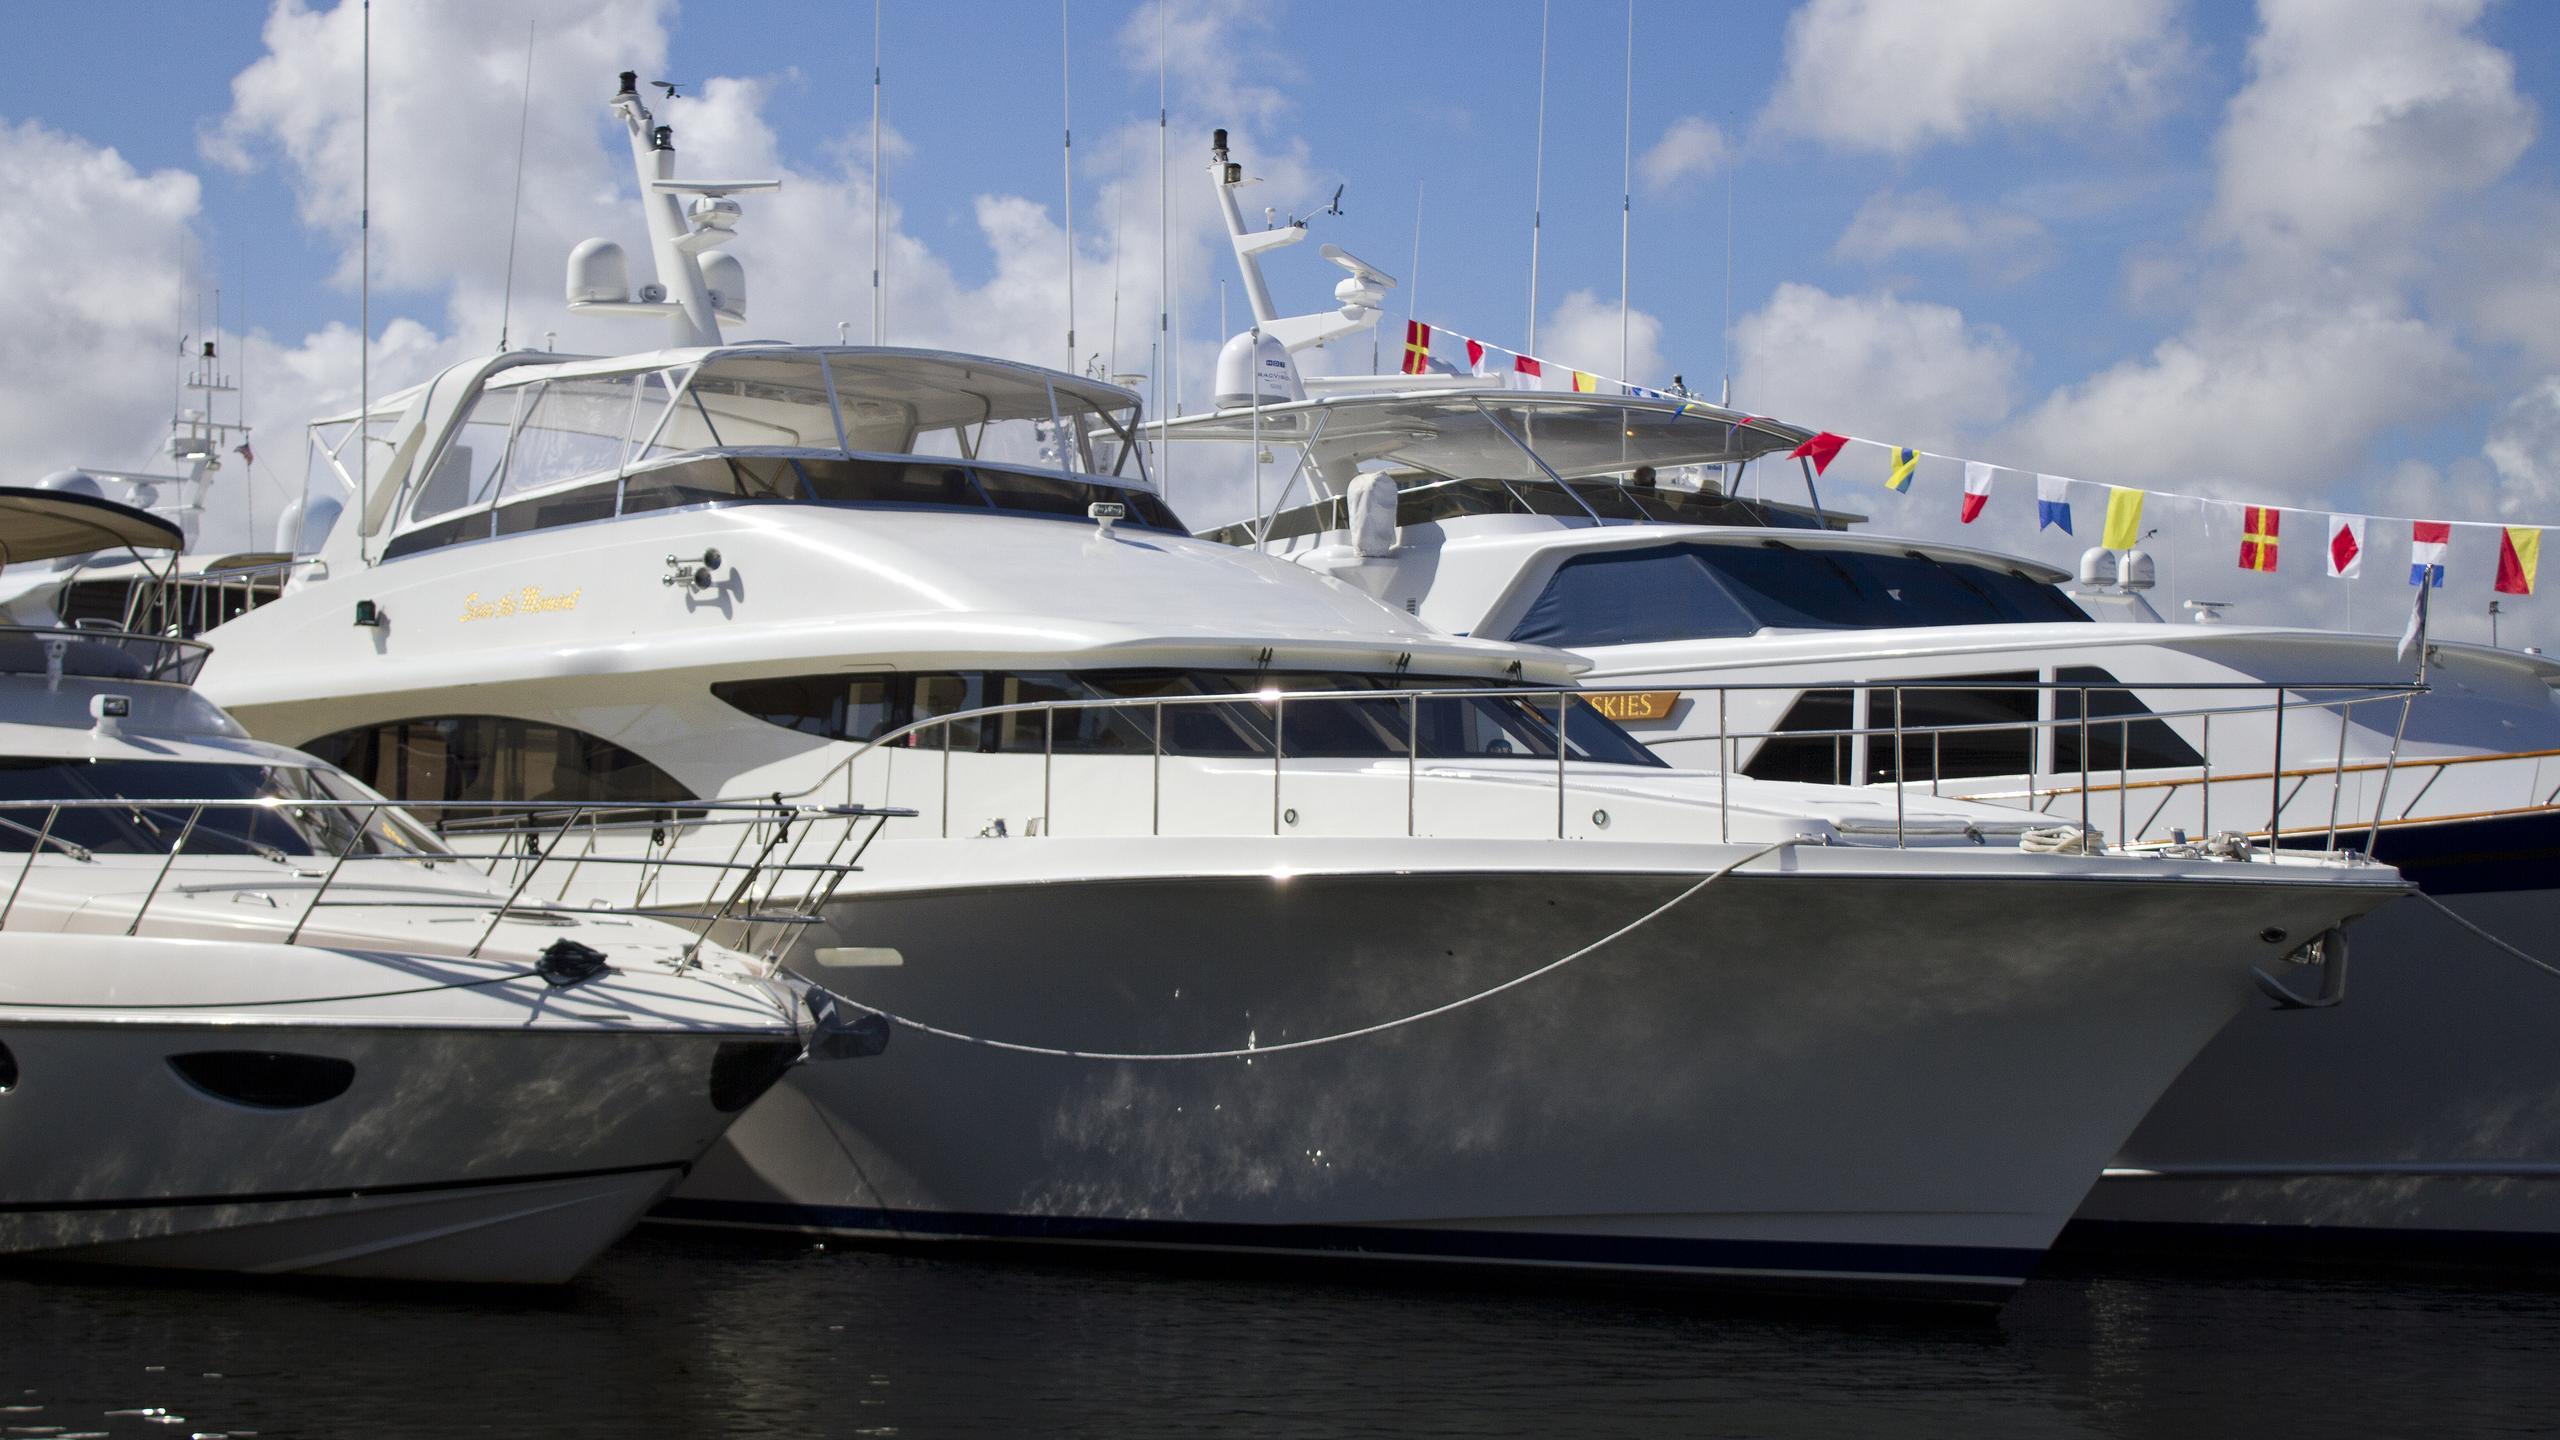 cheoy-lee-81-seas-the-moment-2000-25m-tom-fexas-motor-yacht